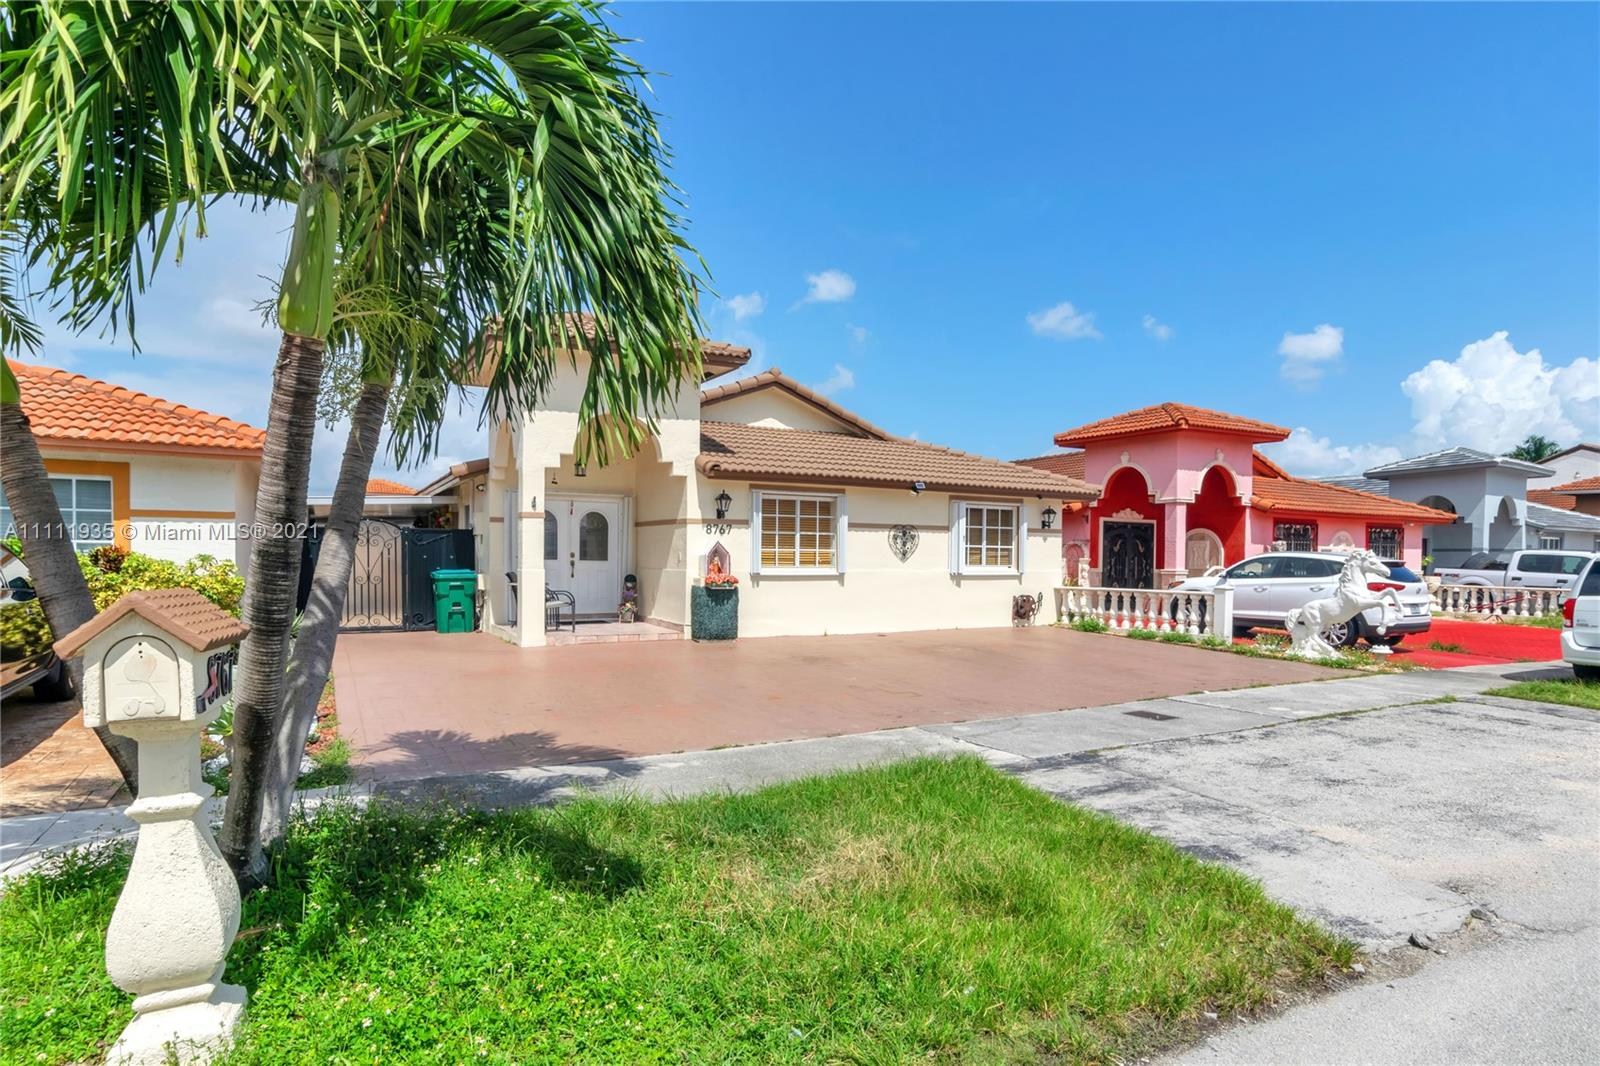 Single Family Home,For Sale,8767 NW 109th Ter, Hialeah Gardens, Florida 33018,Brickell,realty,broker,condos near me